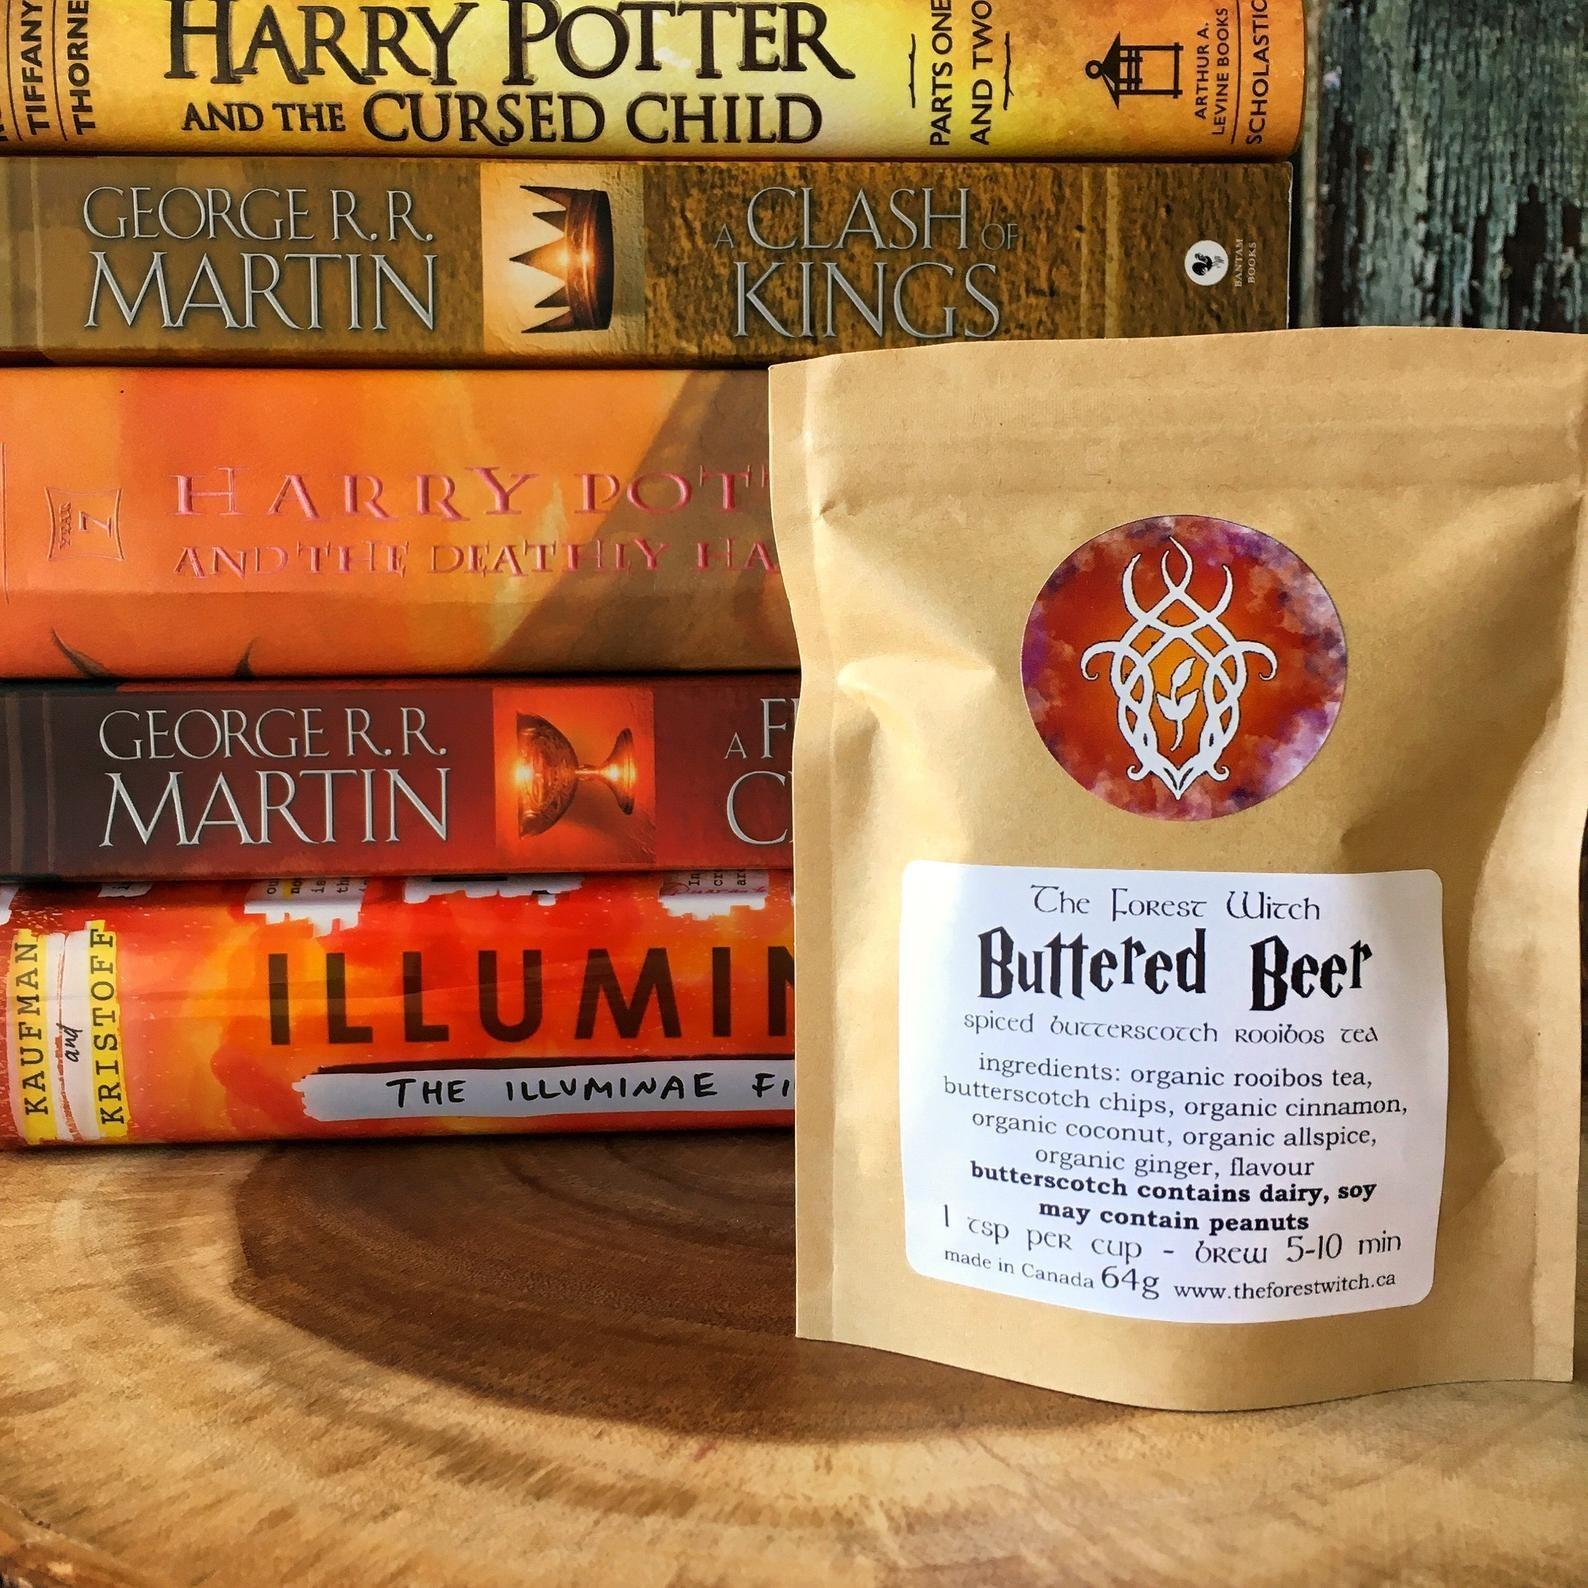 the butter beer tea in packaging